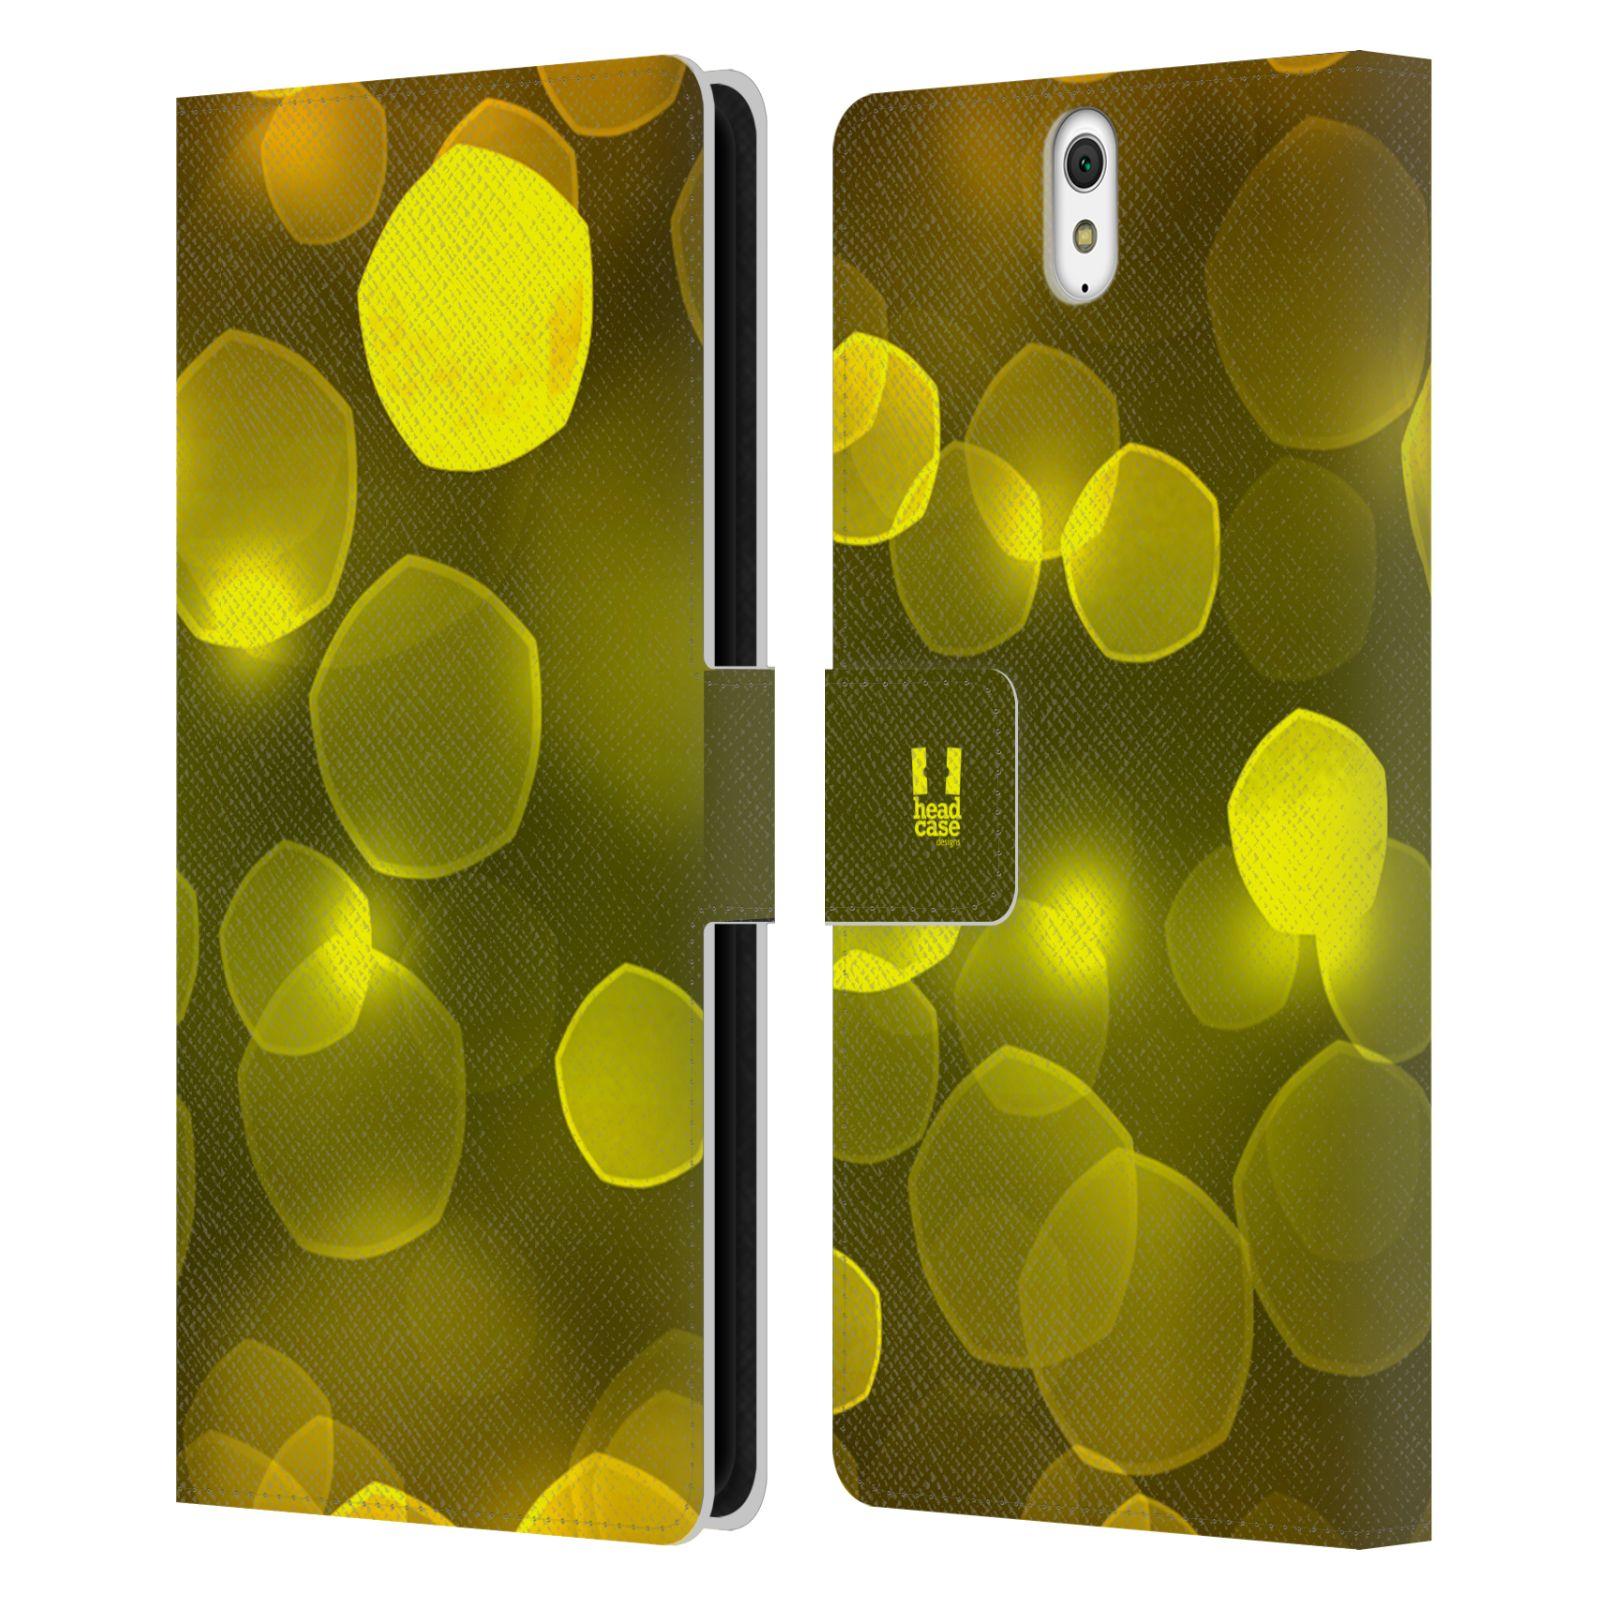 HEAD CASE Flipové pouzdro pro mobil SONY XPERIA C5 Ultra BOKEH zářící vzor pentagon žlutá